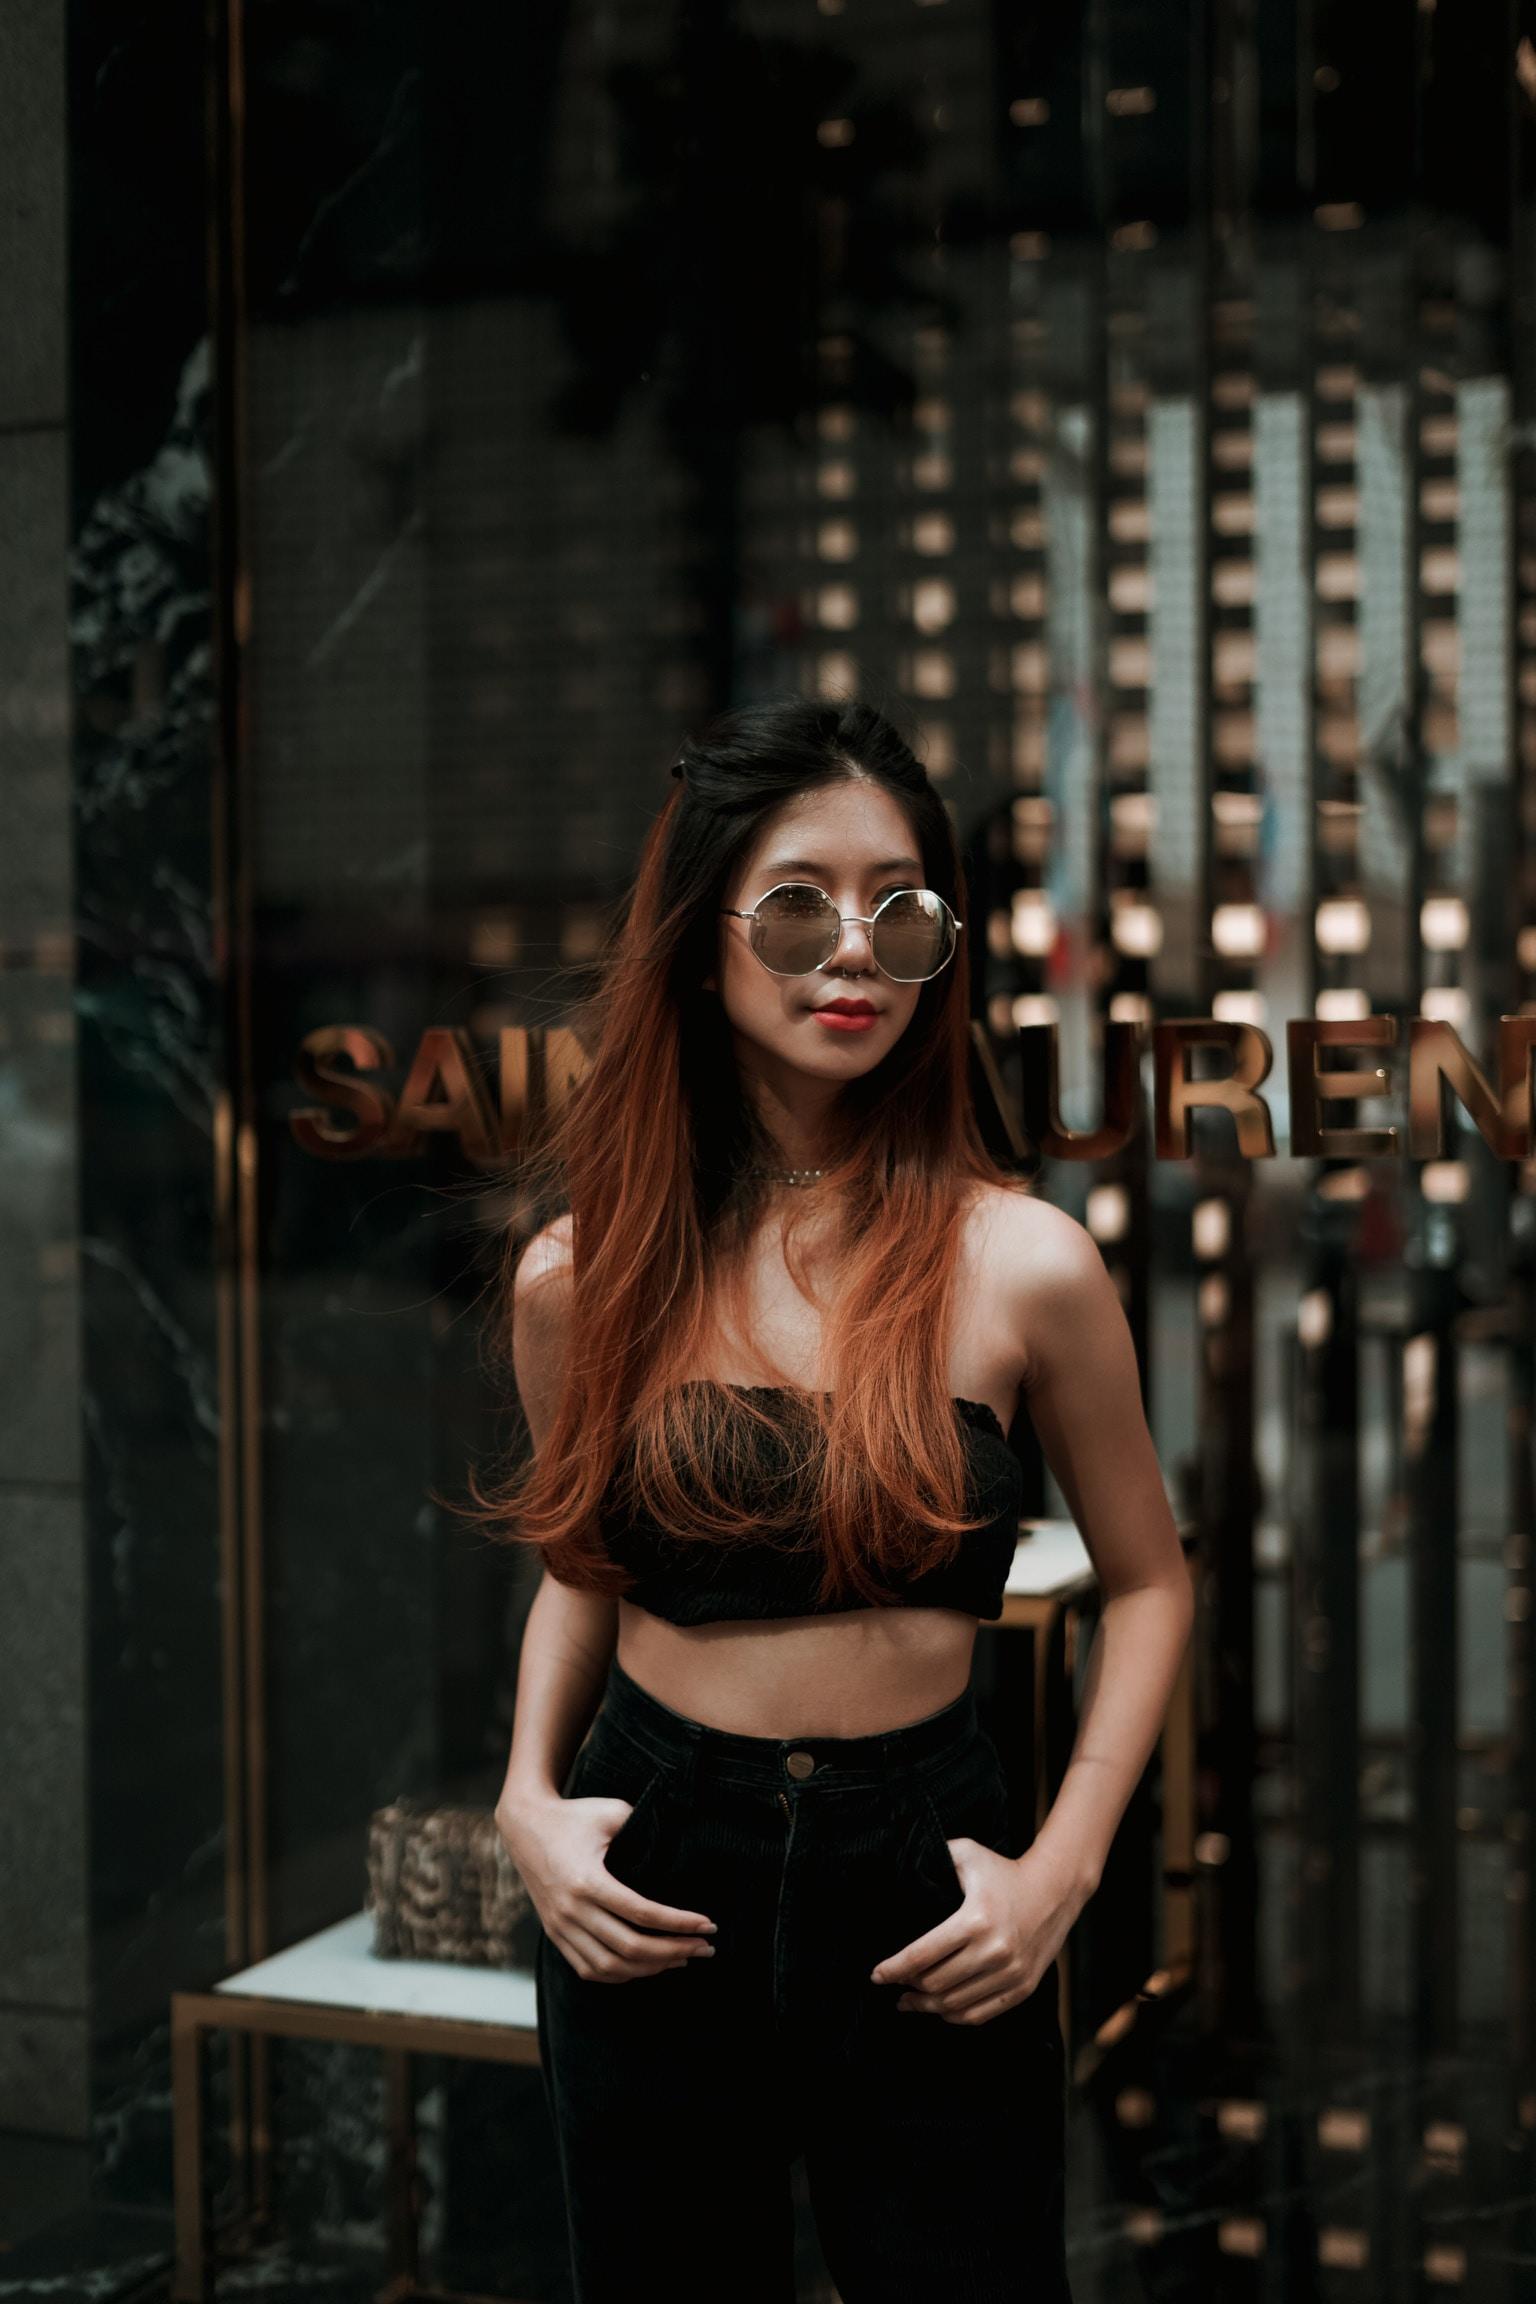 woman in black crop top standing near establishment